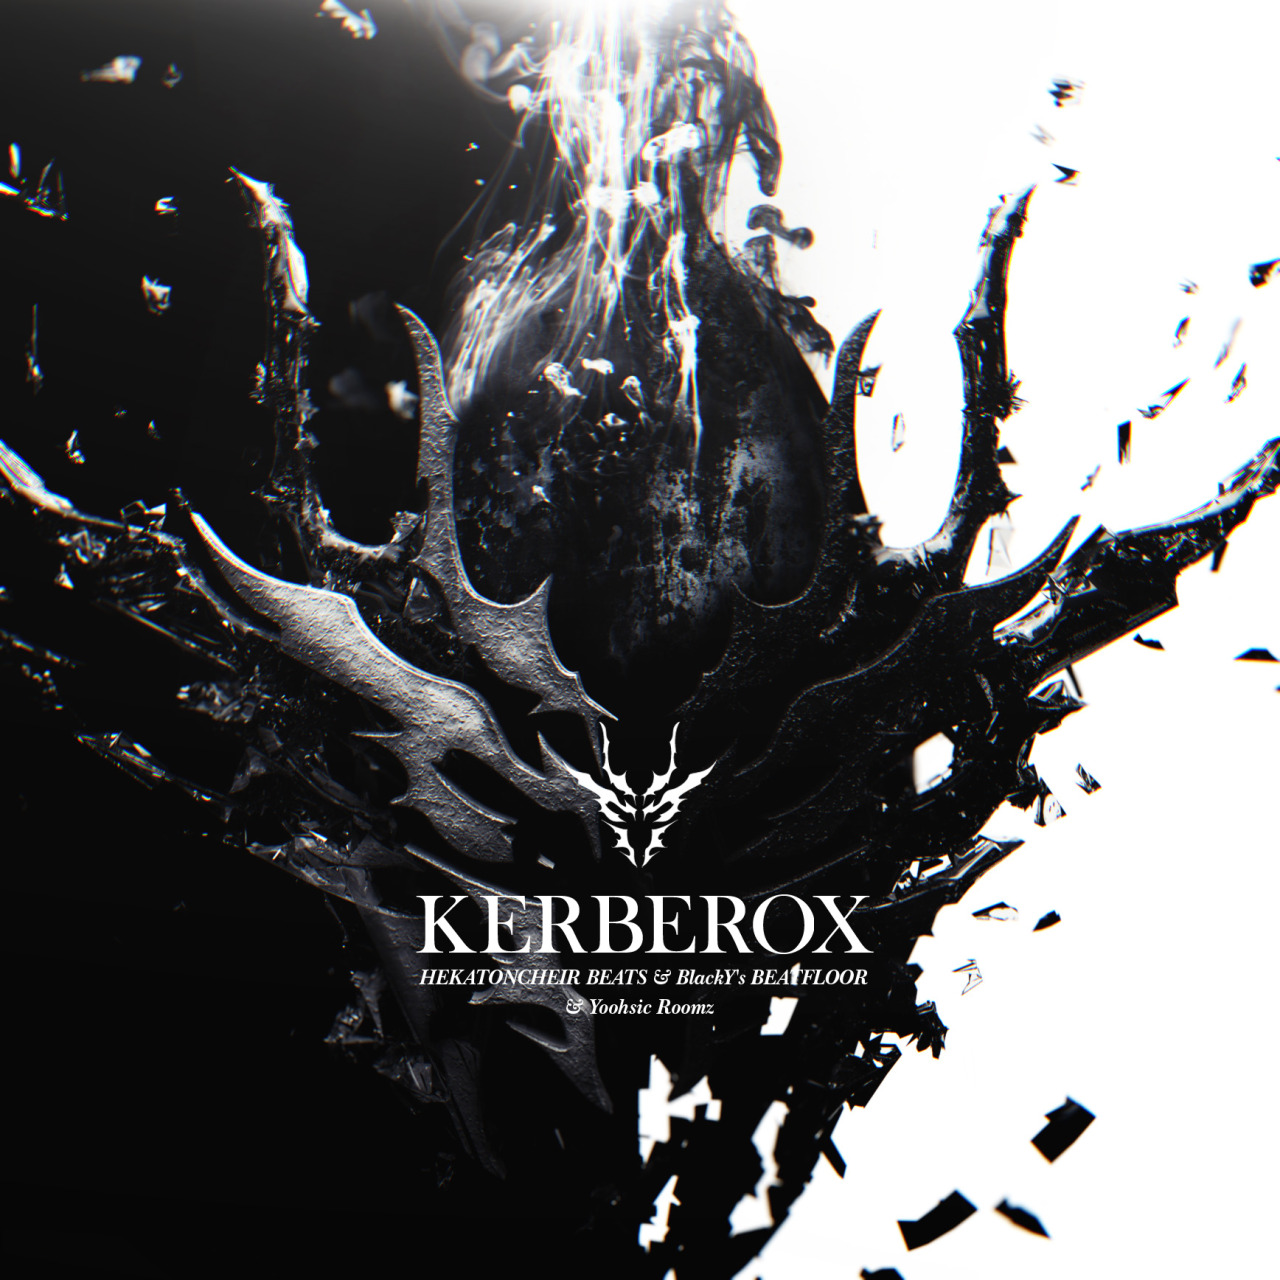 KERBEROX